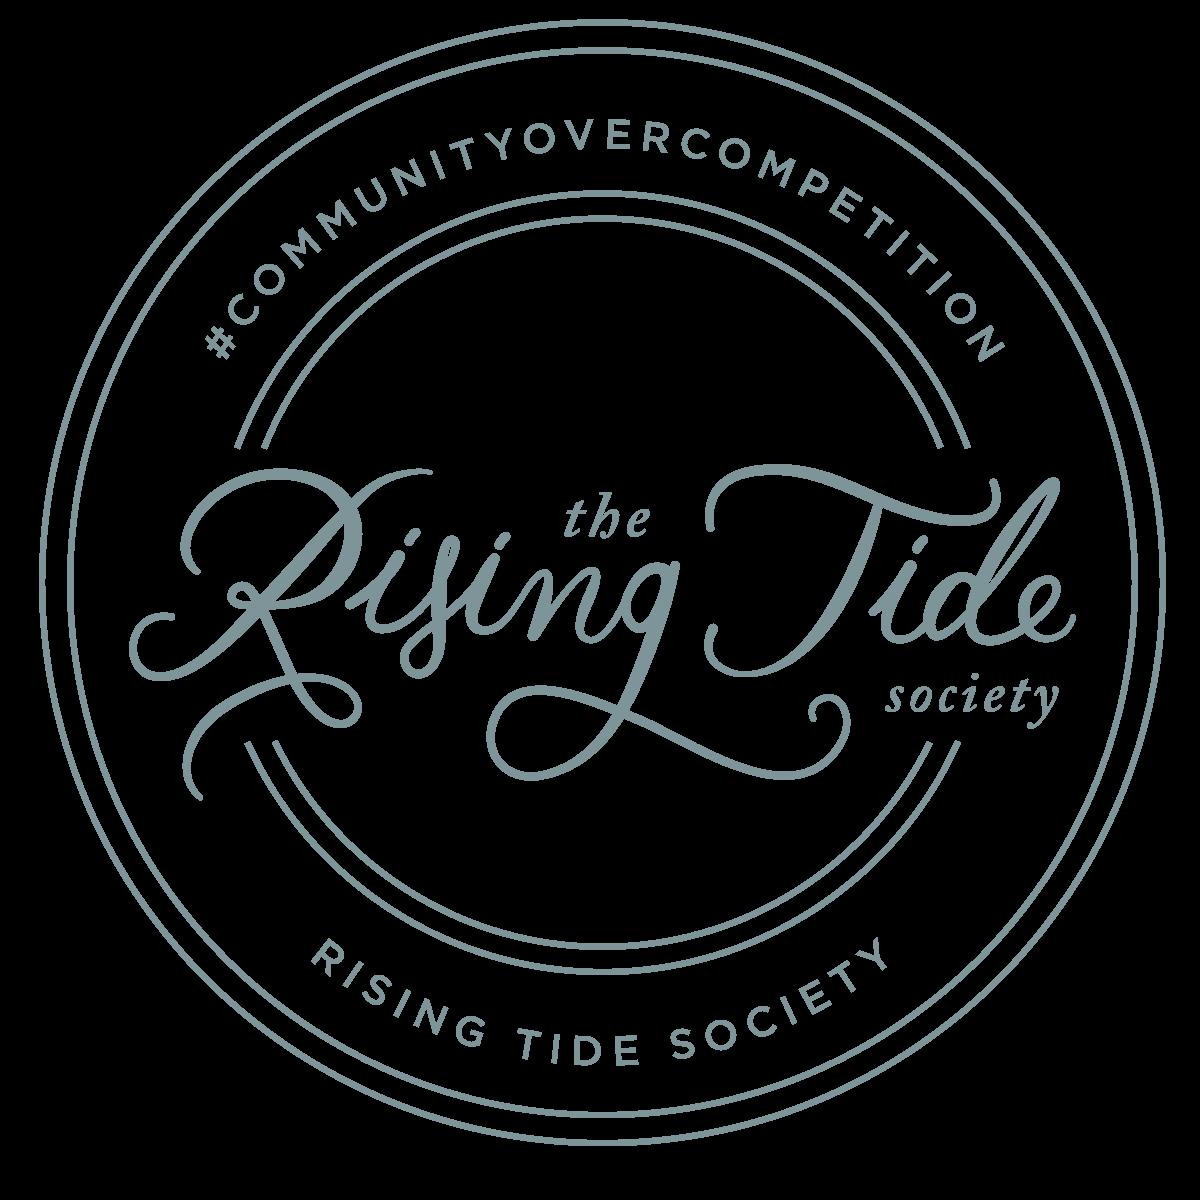 Member of Rising Tide Society